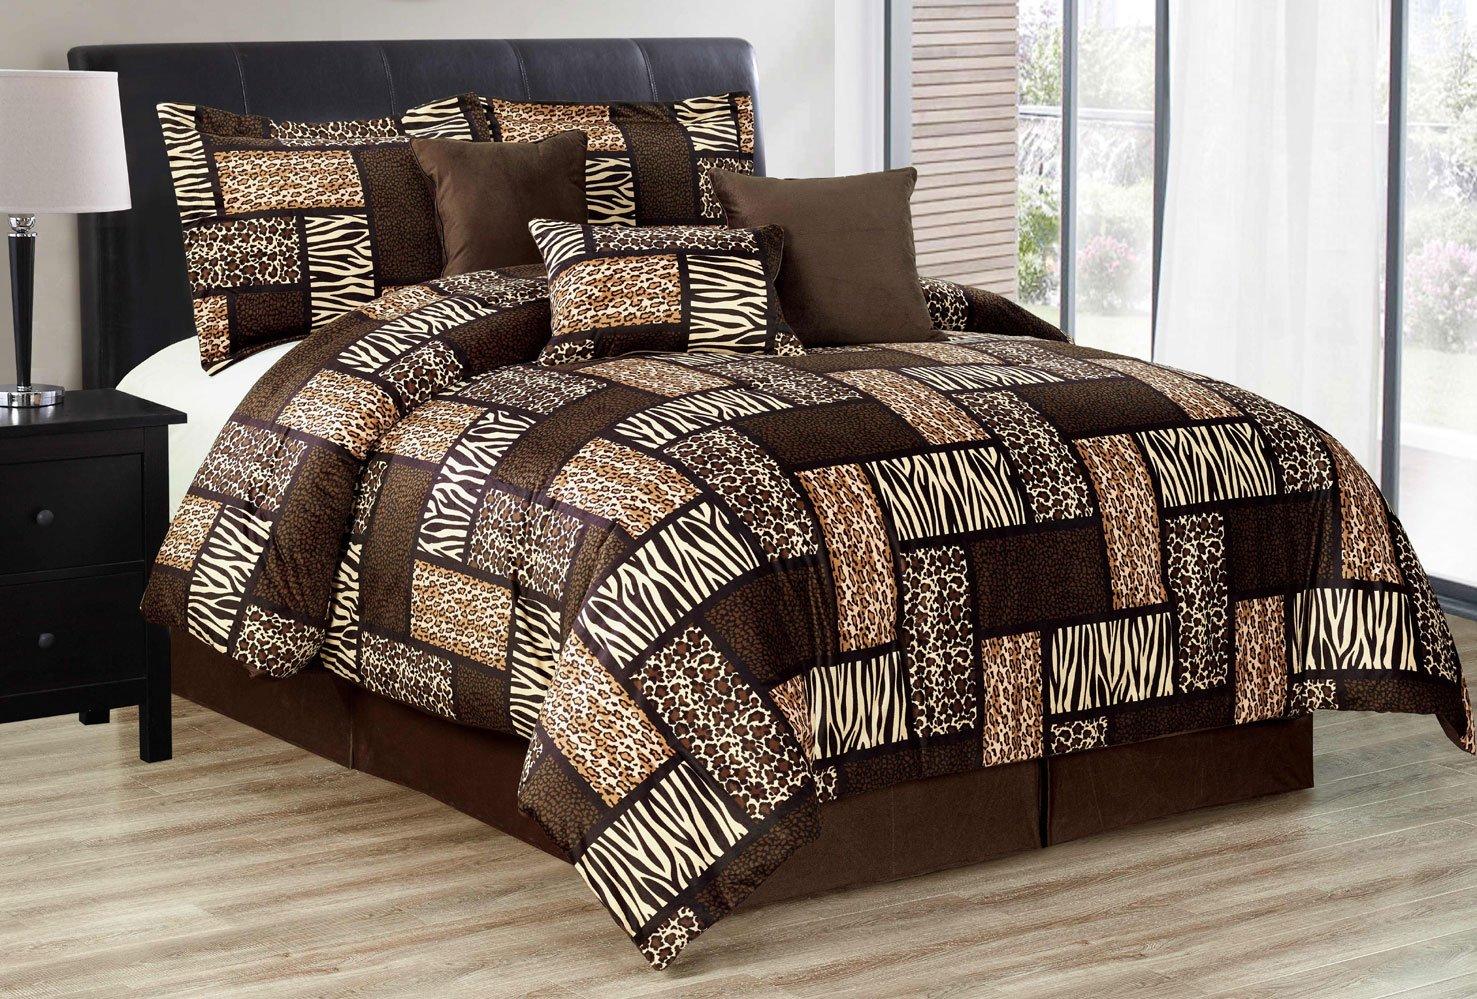 Grand Linen Black/Brown Comforter Set Animal Print Safari